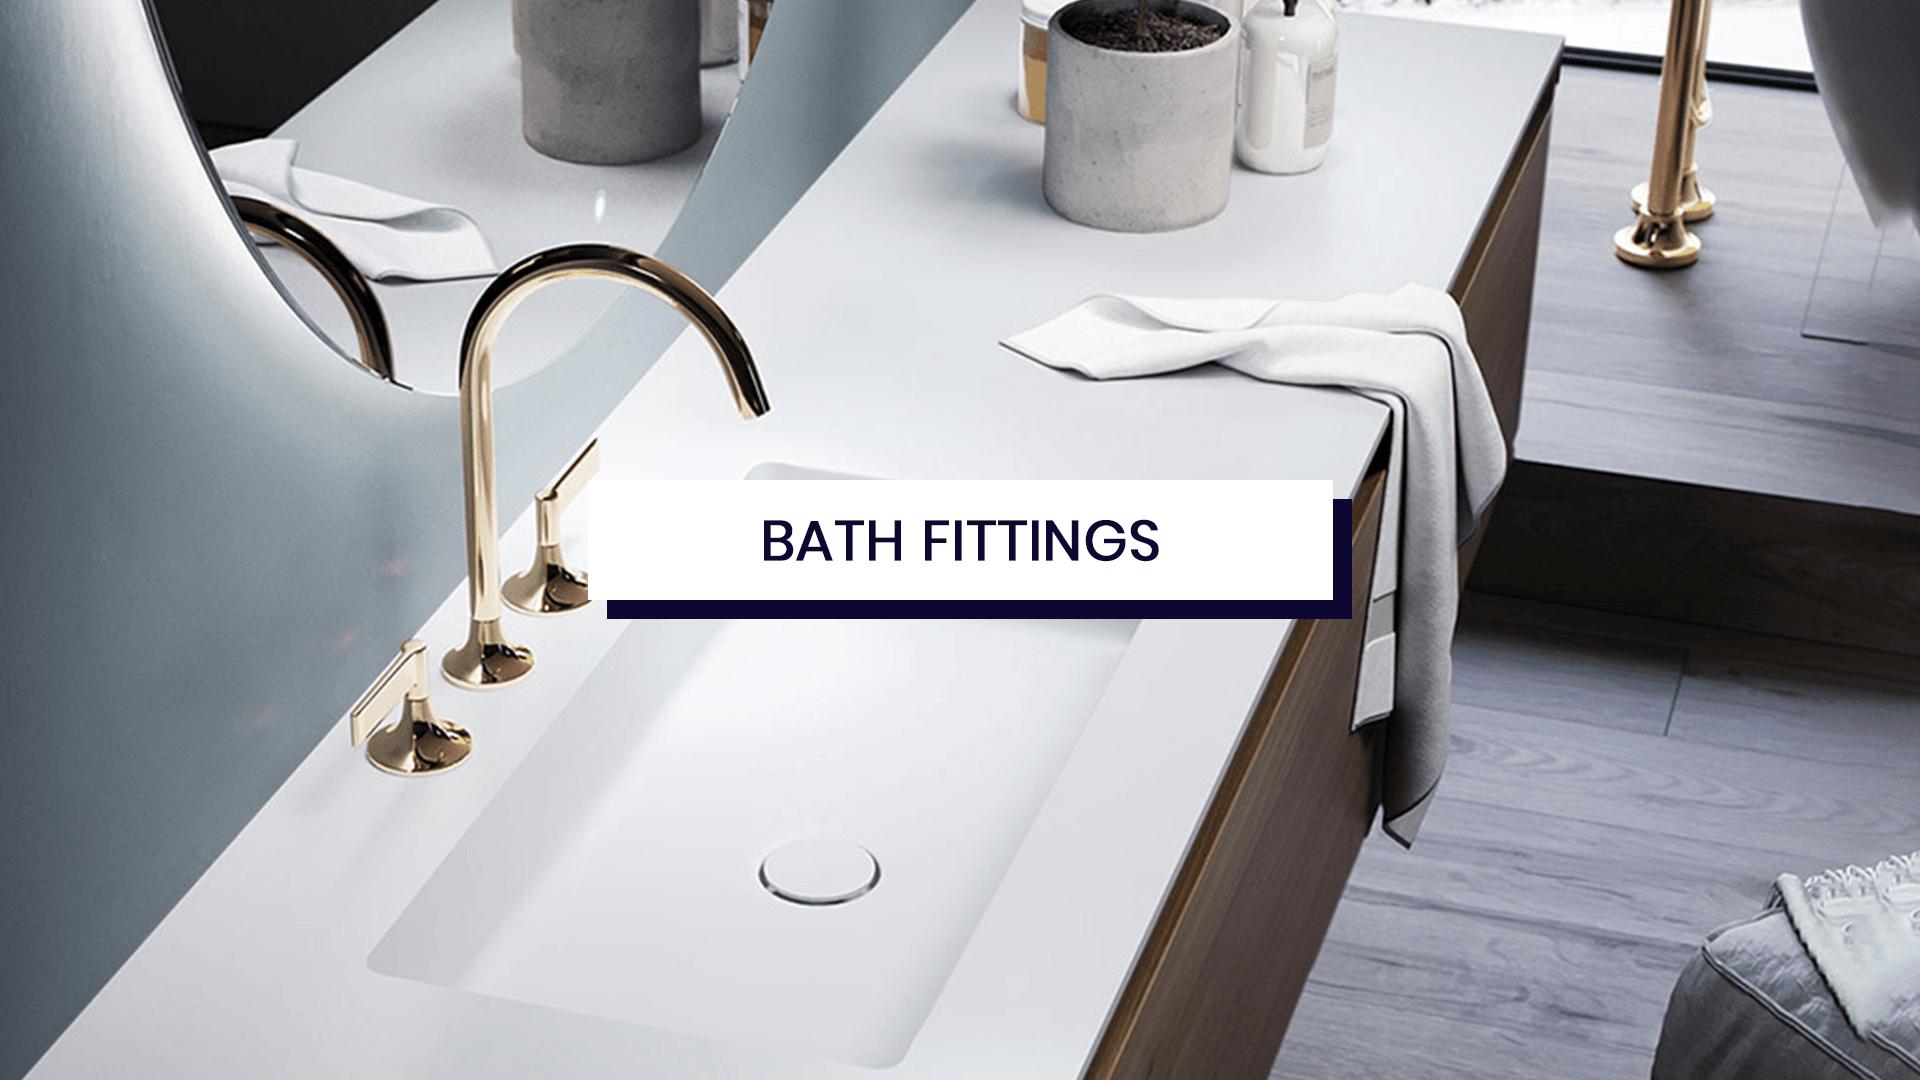 New Arrival – Bath Fittings